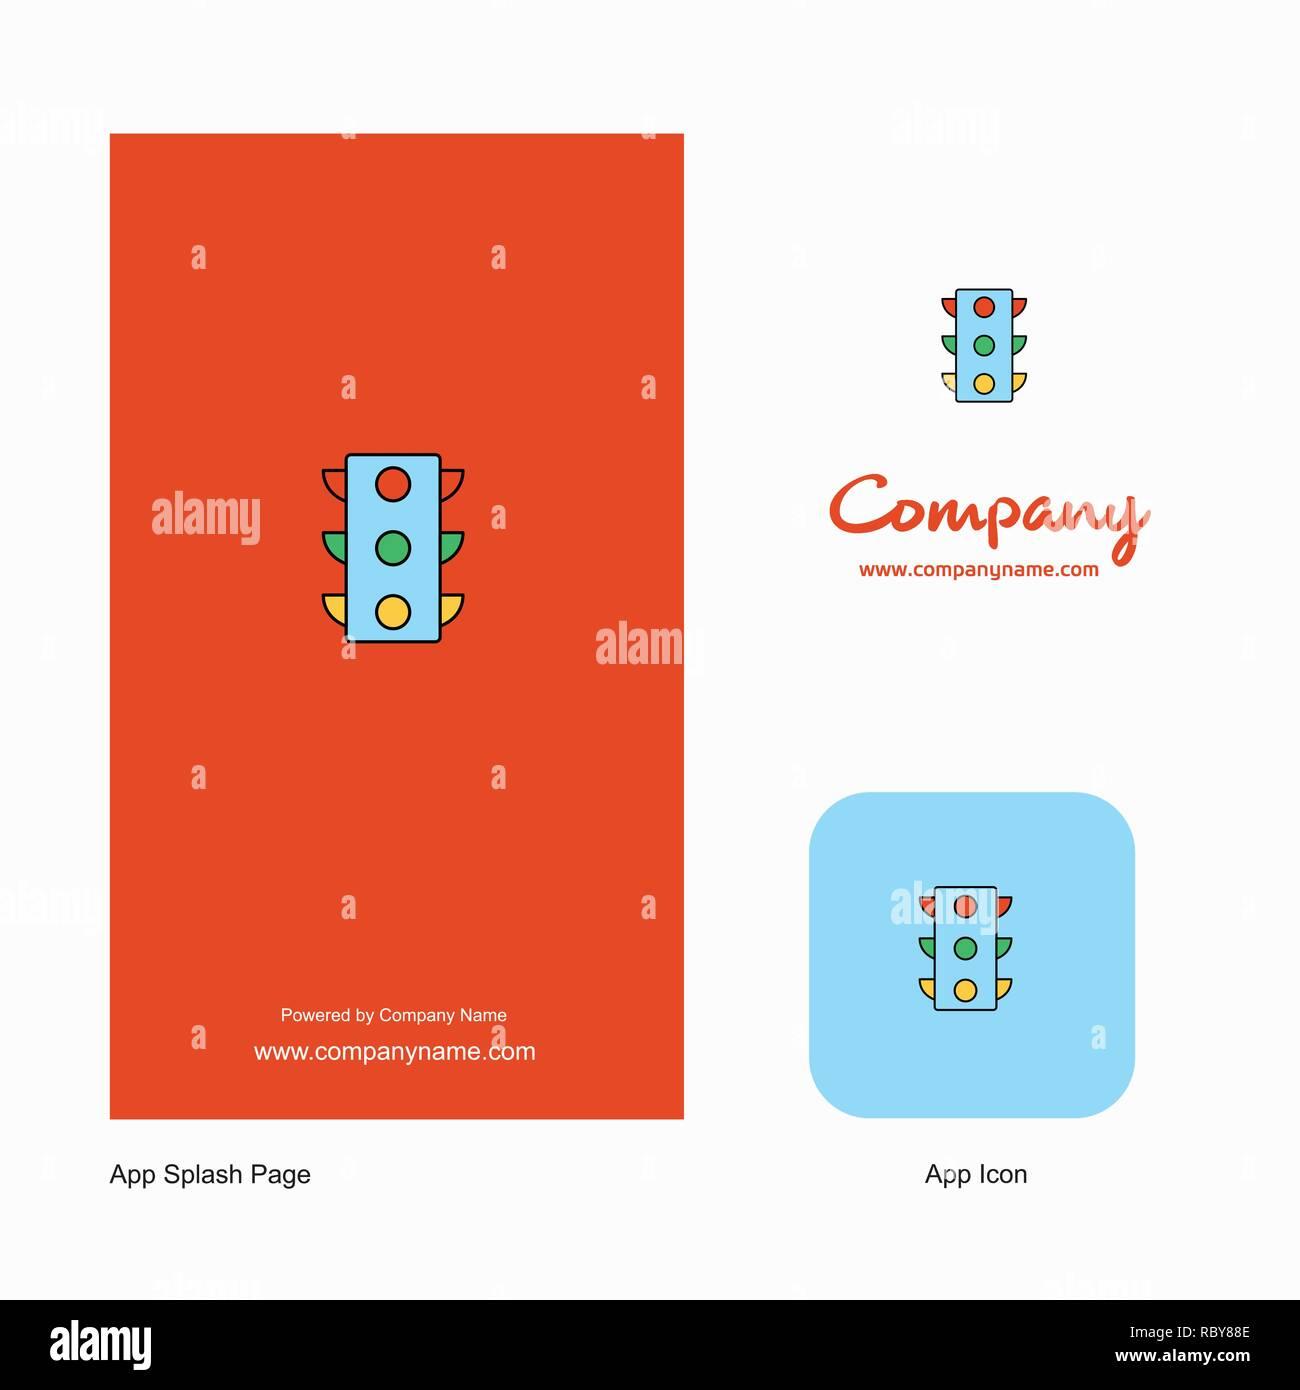 Traffic signals Company Logo App Icon and Splash Page Design